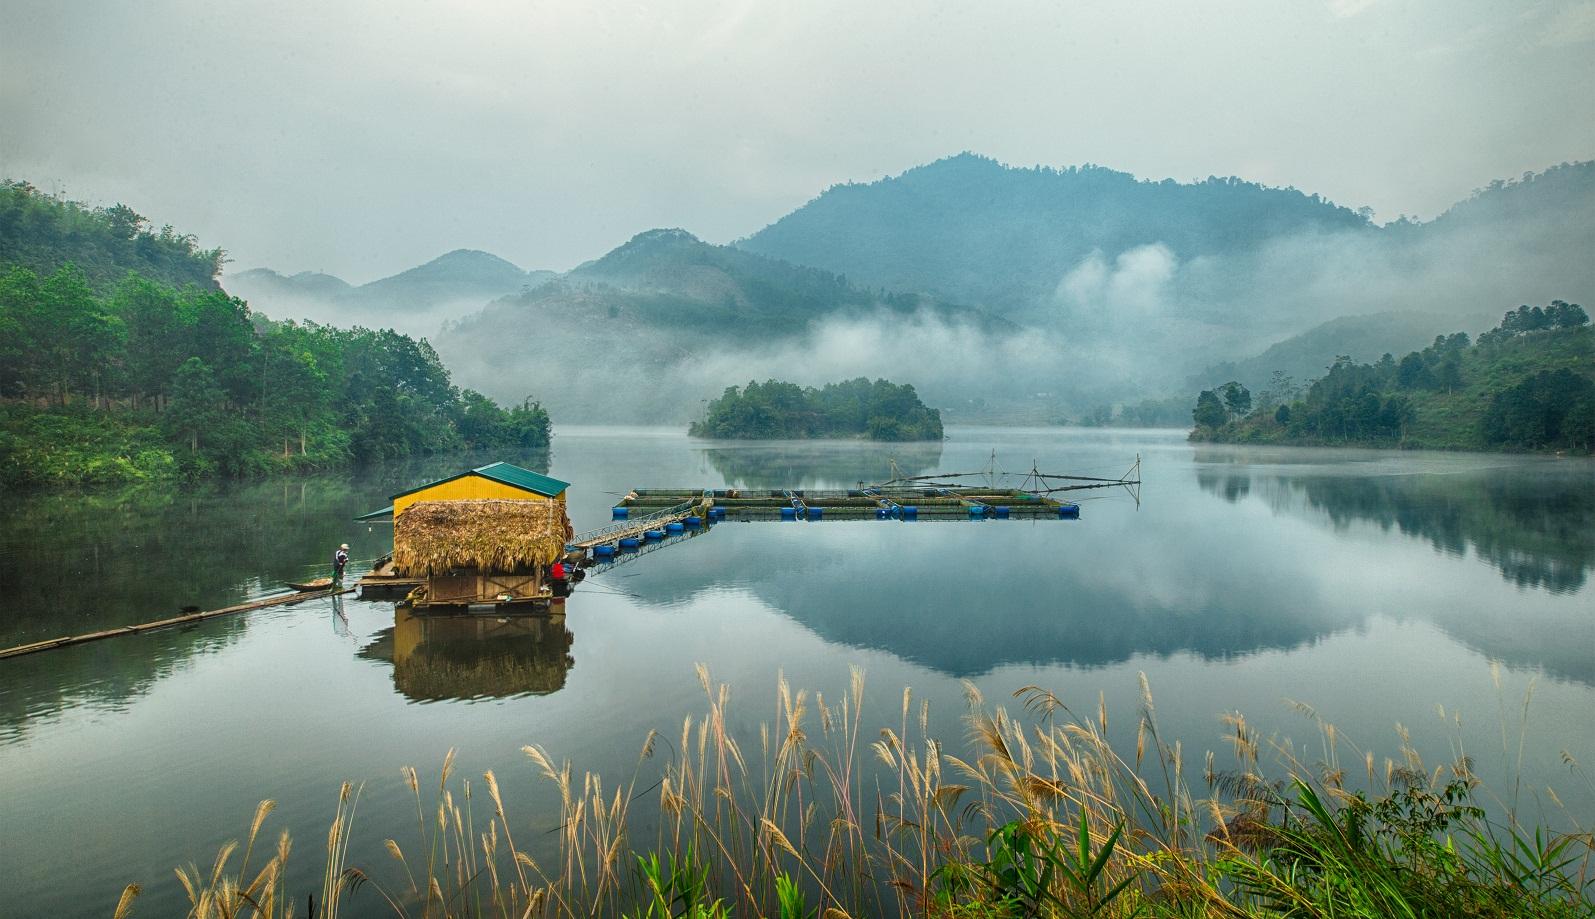 du lịch Phú Thọ 15